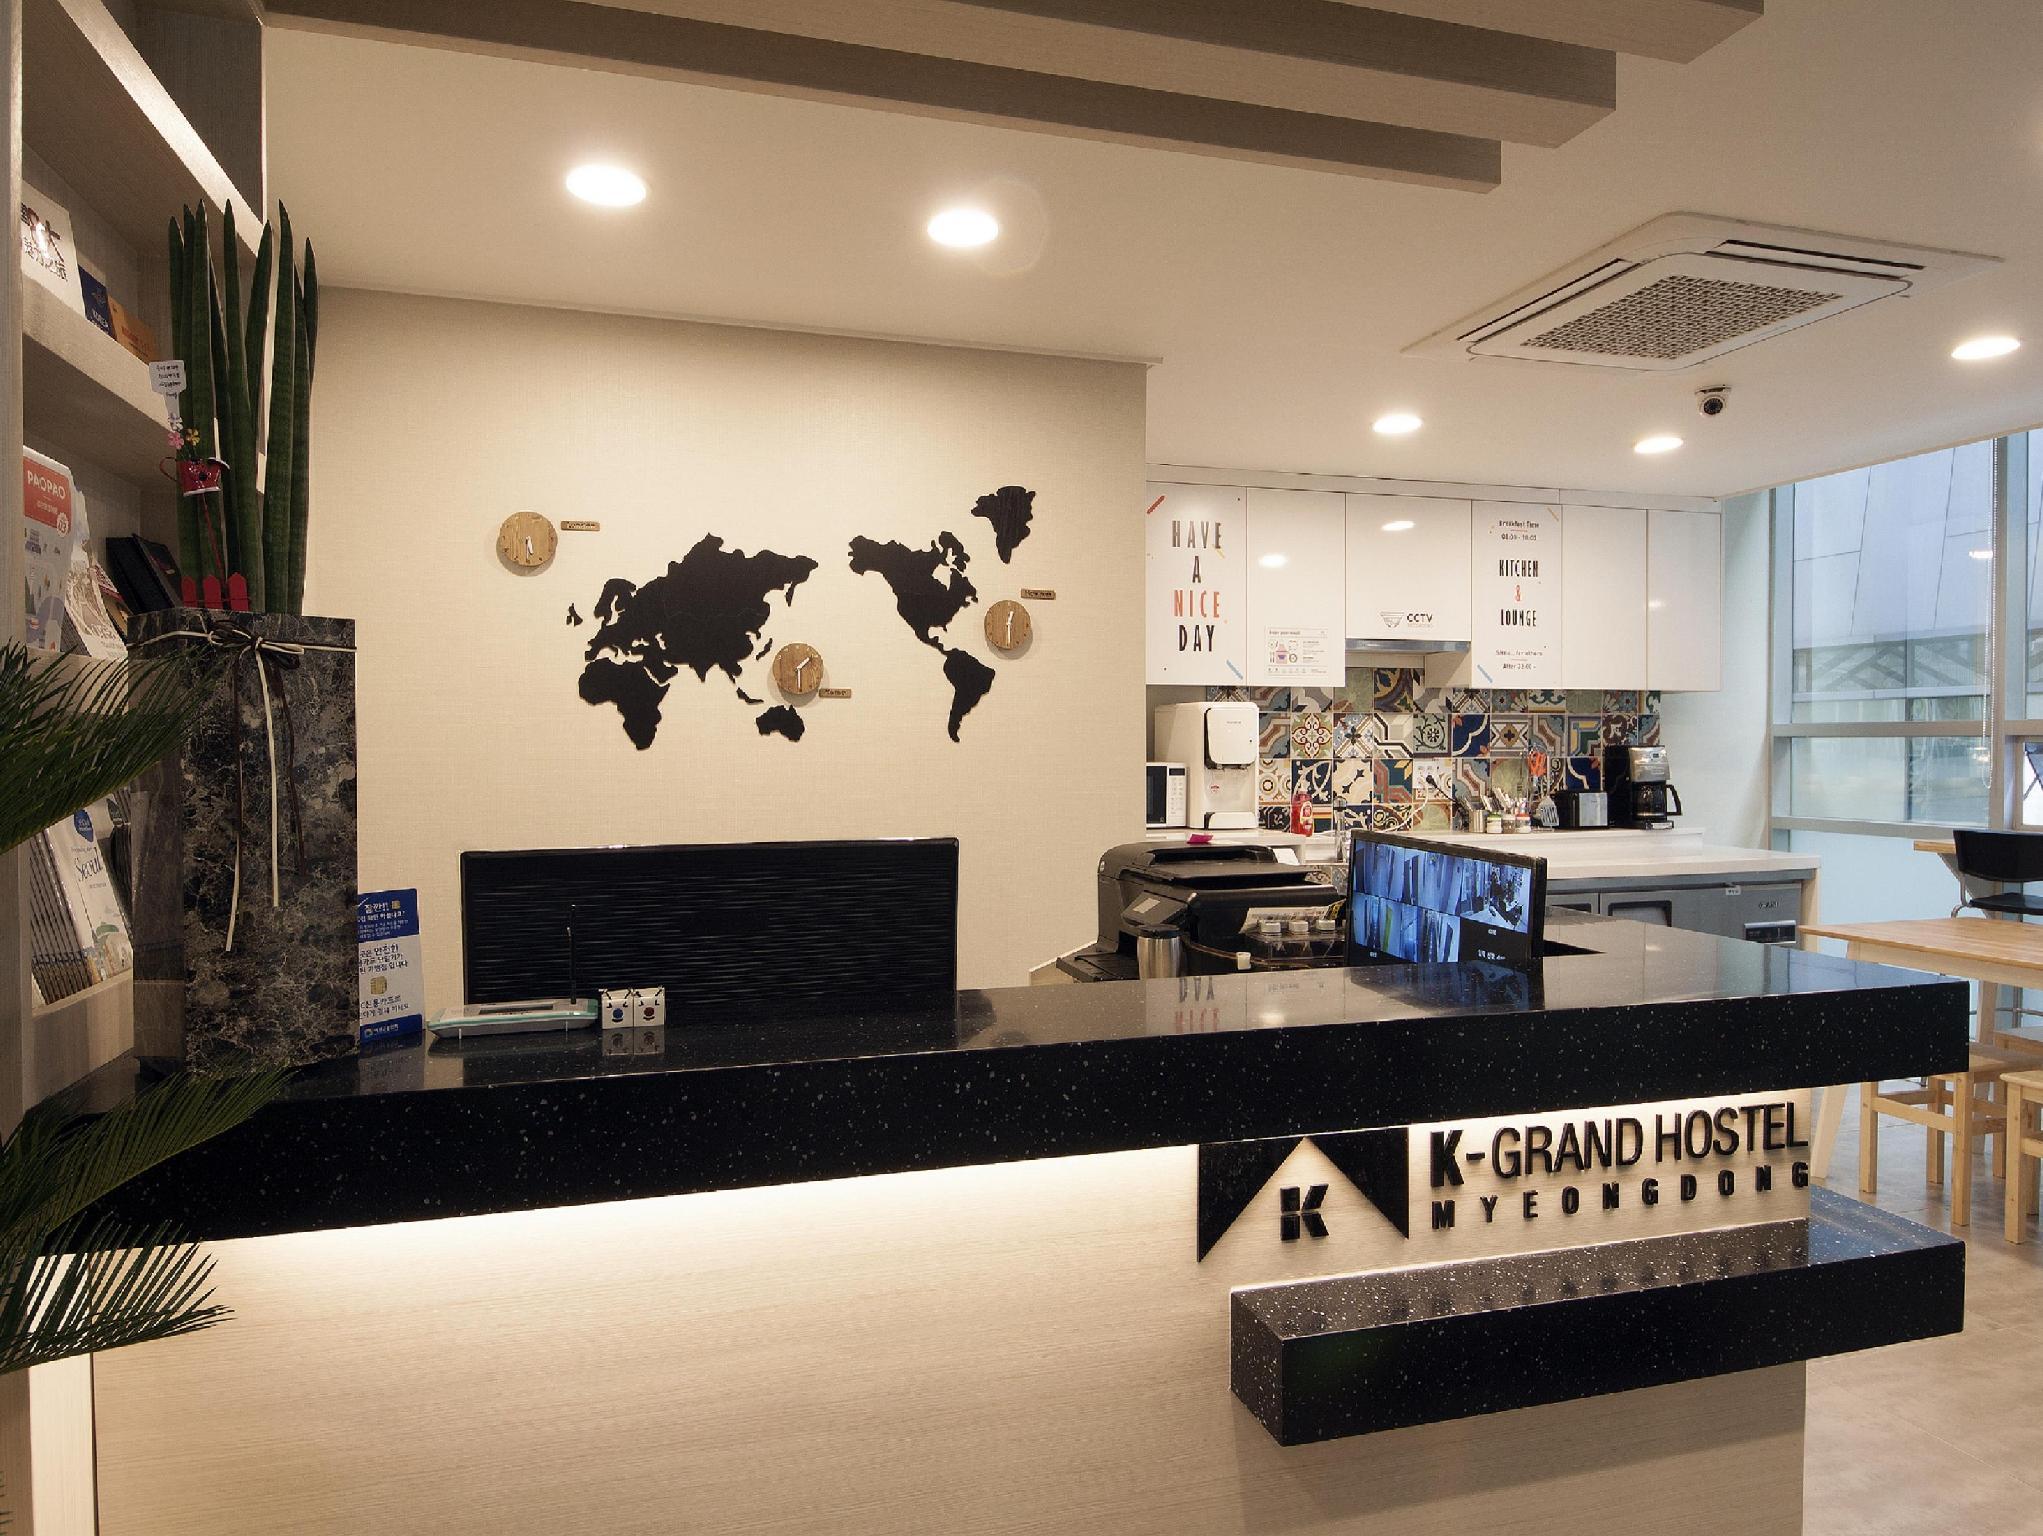 K Grand Hostel Myeongdong